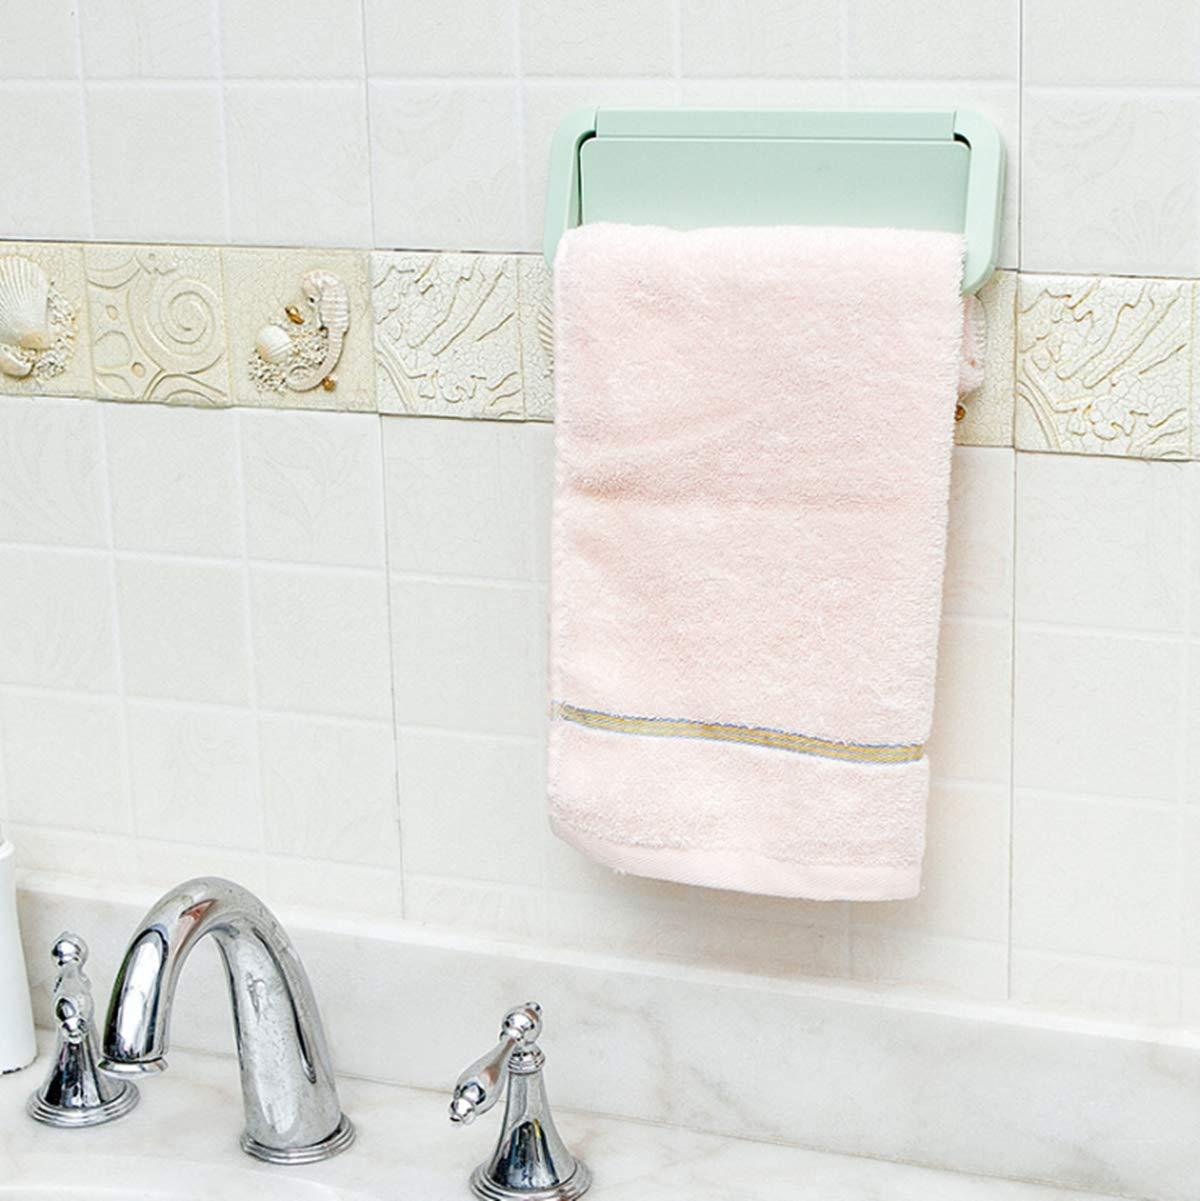 Teabelle toallero Barra plástico Plegable Perchero Adhesivo para Colgar Toalla Trapo y repasador en Cocina baño Soporte Autoadhesivo para Puerta Pared ...